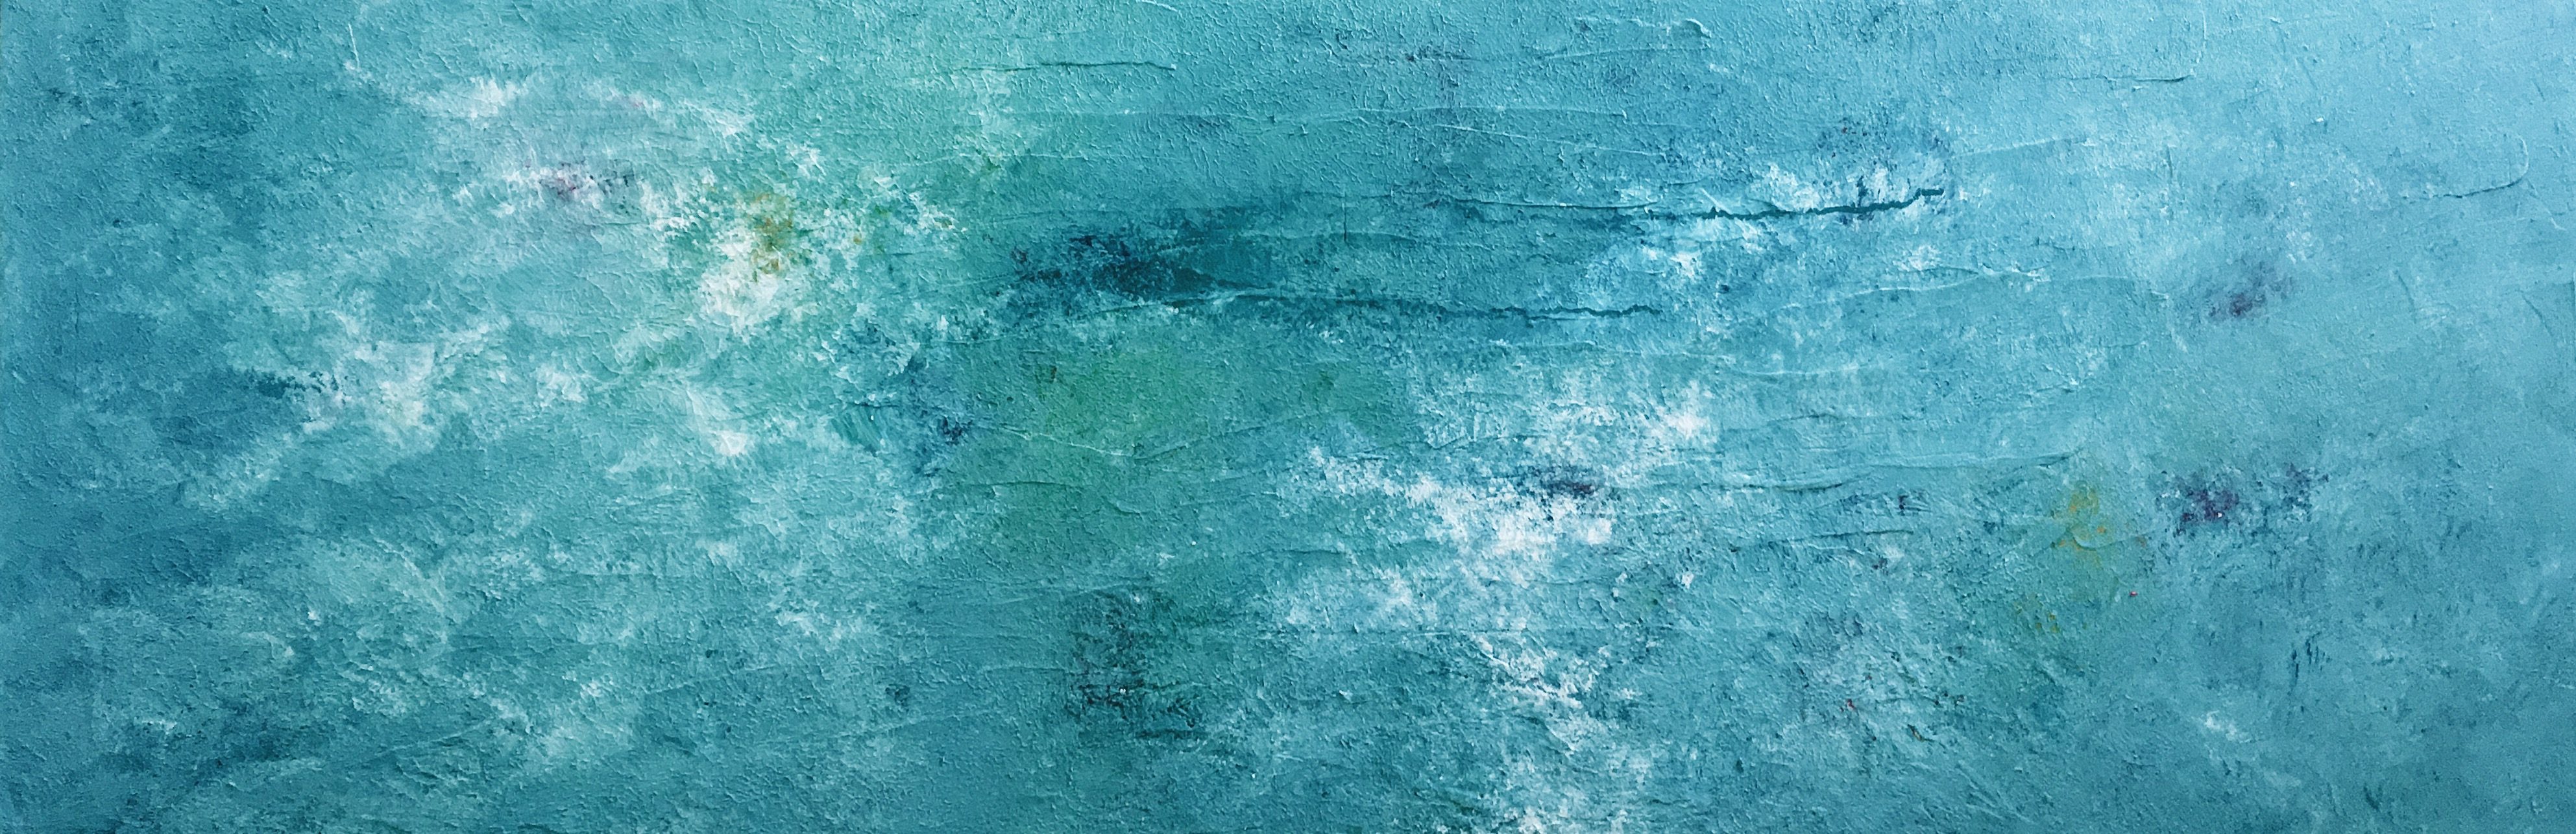 Marine Bonzom - Artiste Peintre Biarritz - Paulownia